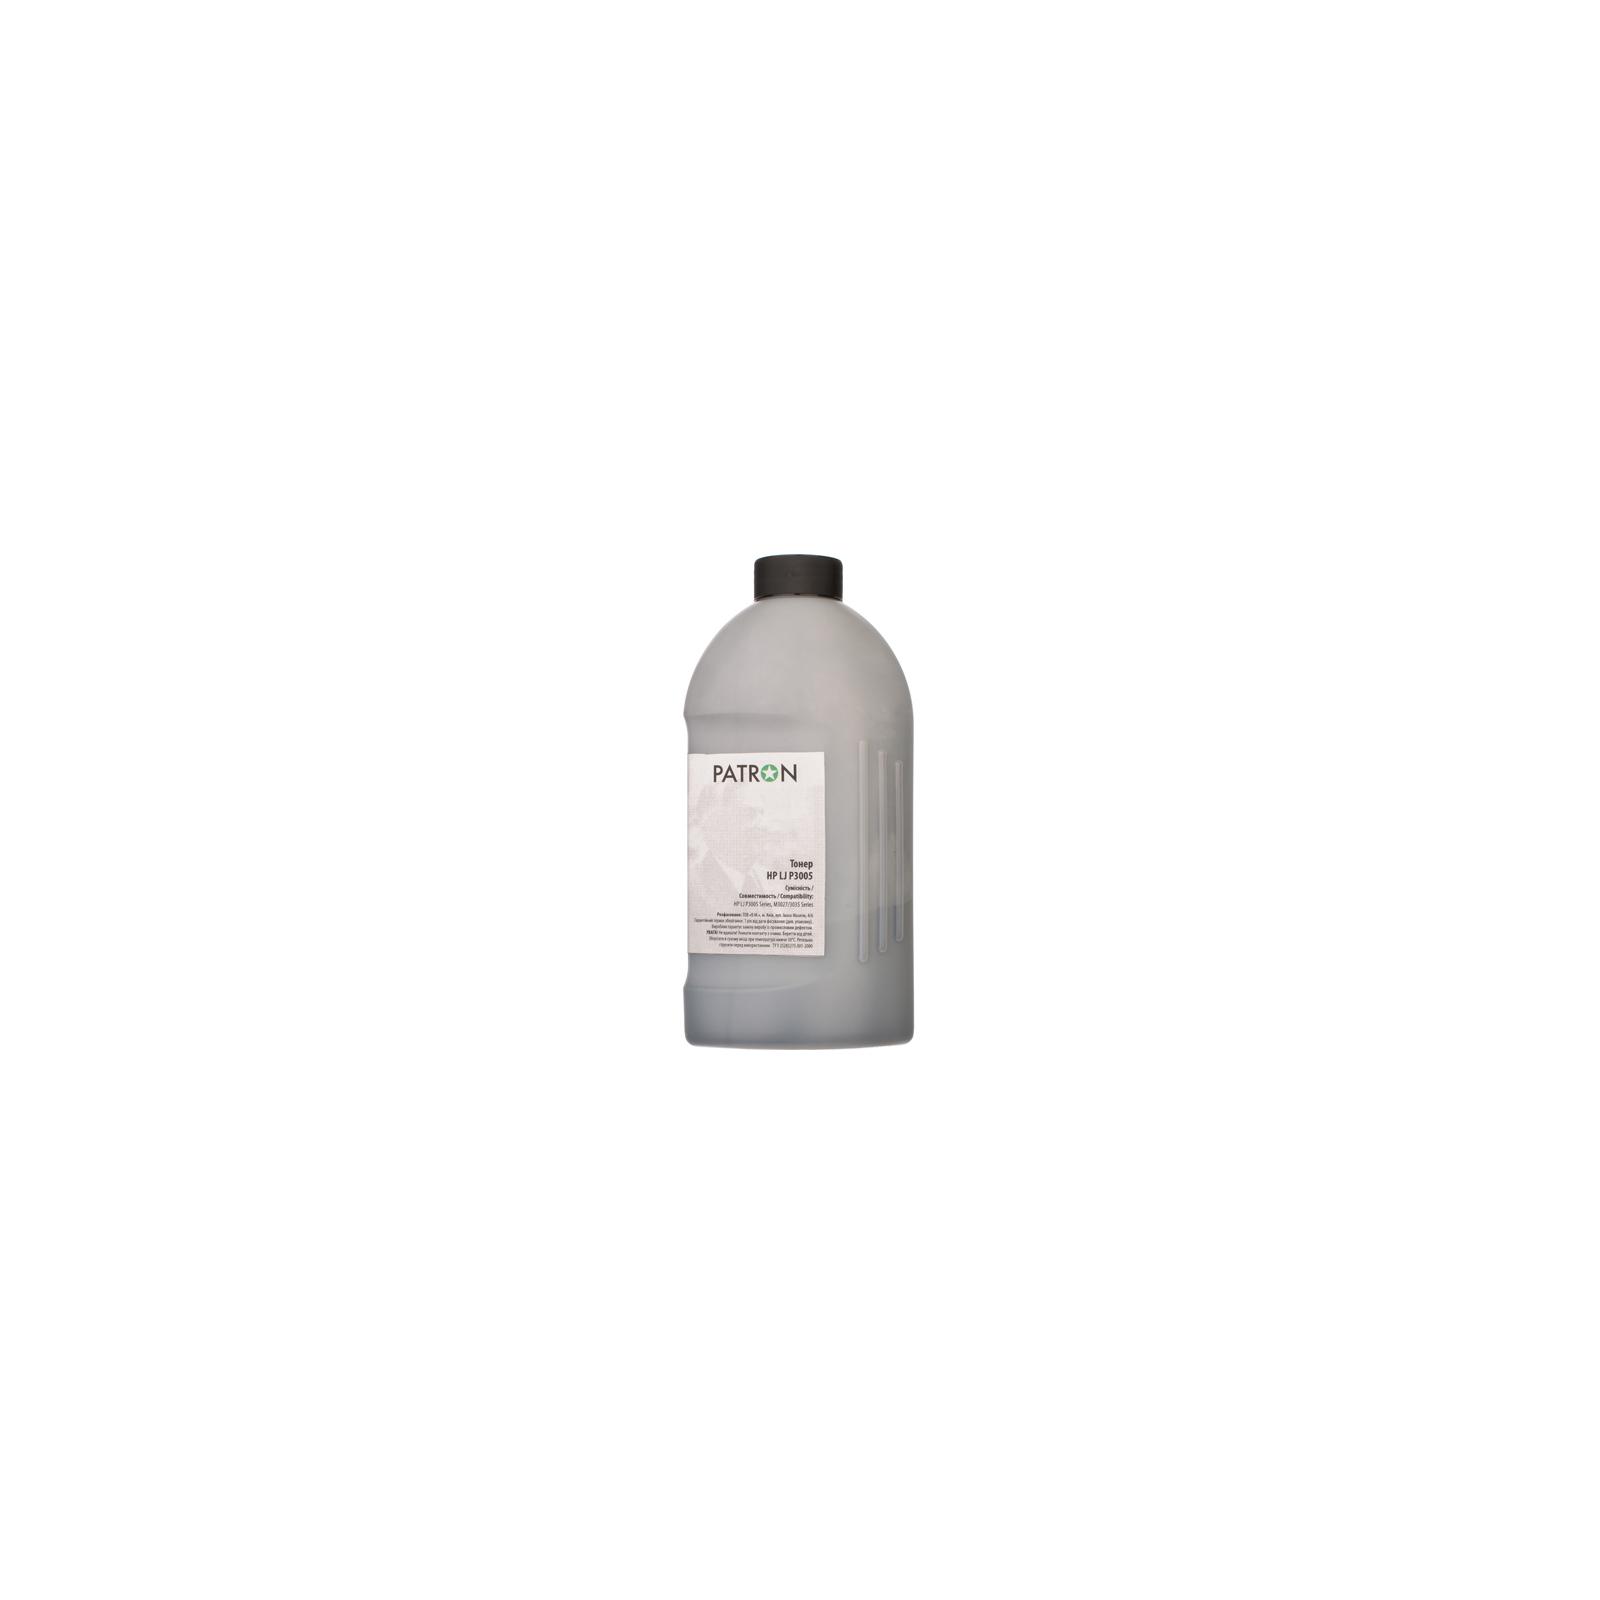 Тонер PATRON HP LJ P3005 340г (PN-HLJP3005-340) изображение 2